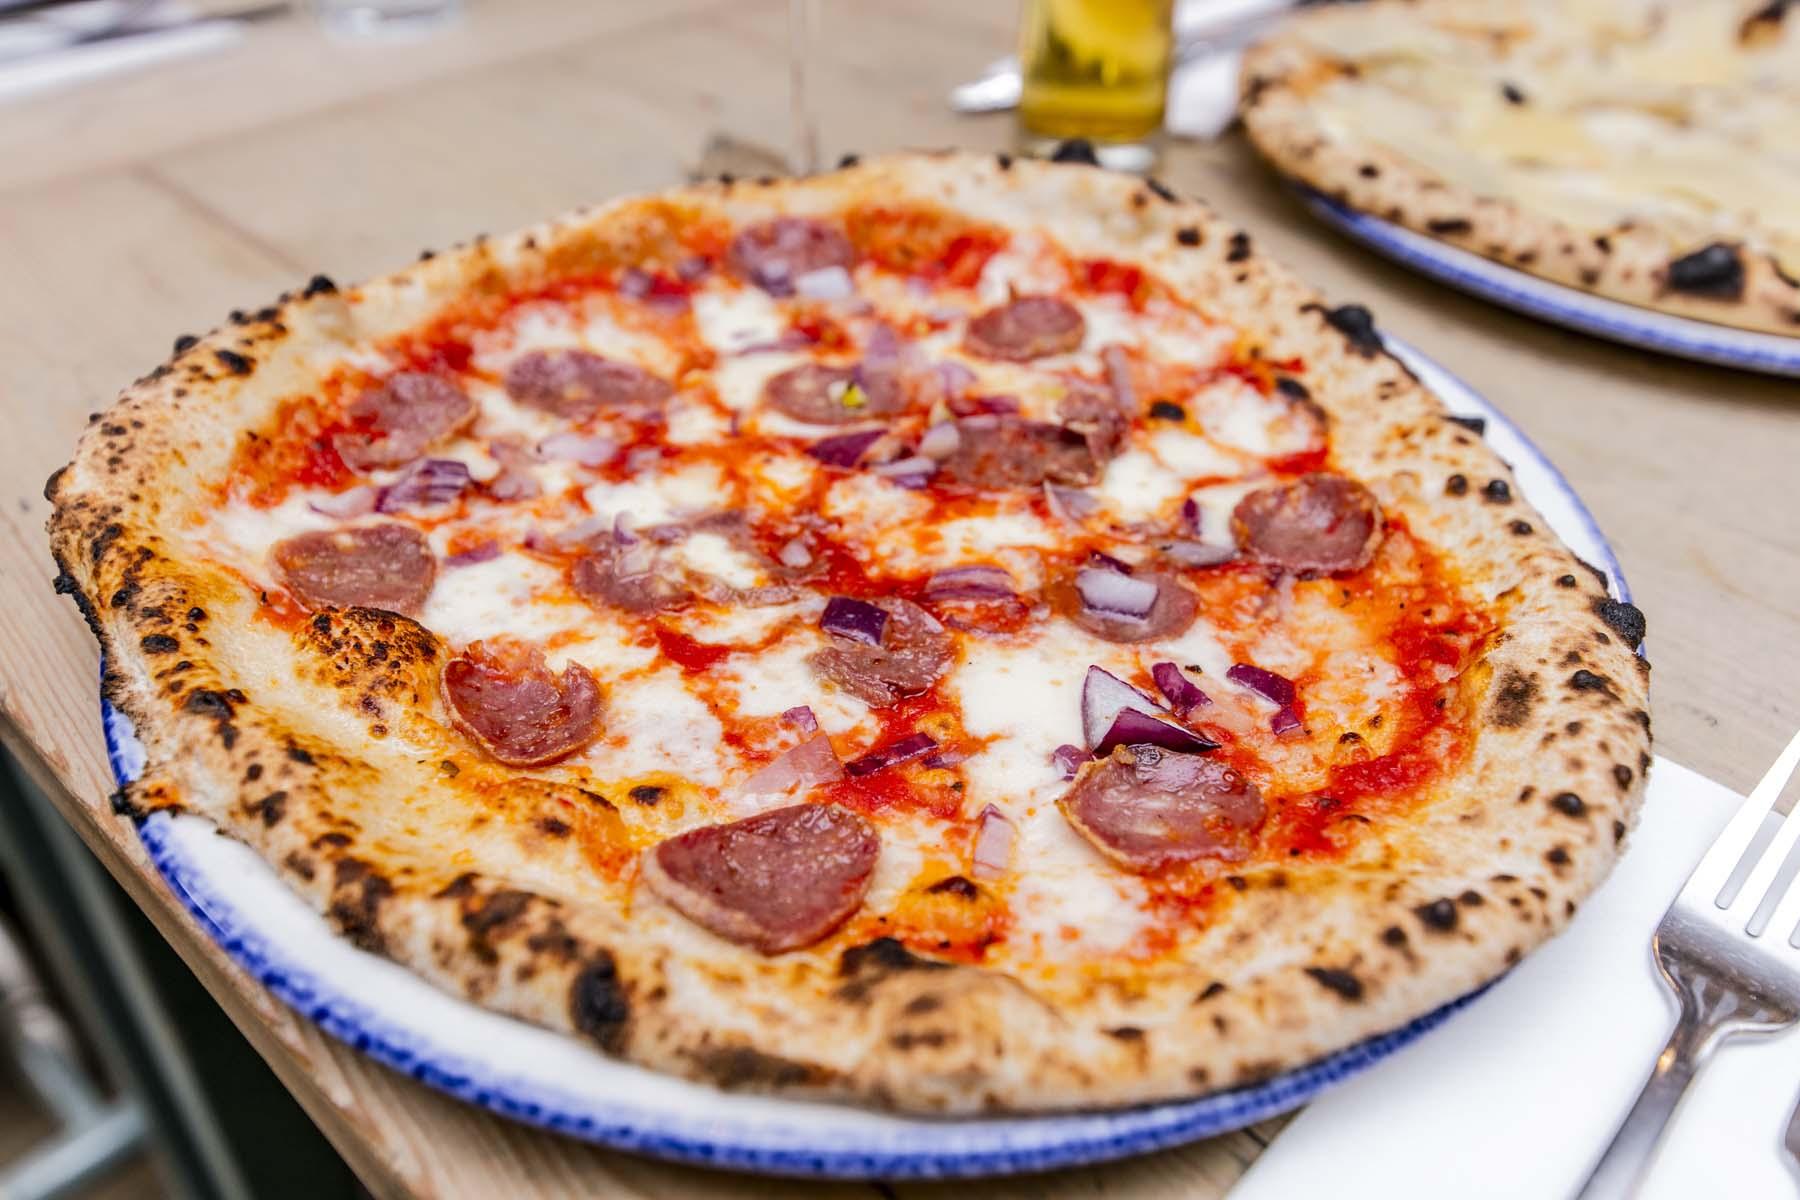 PAUSE Eats: Amici Miei